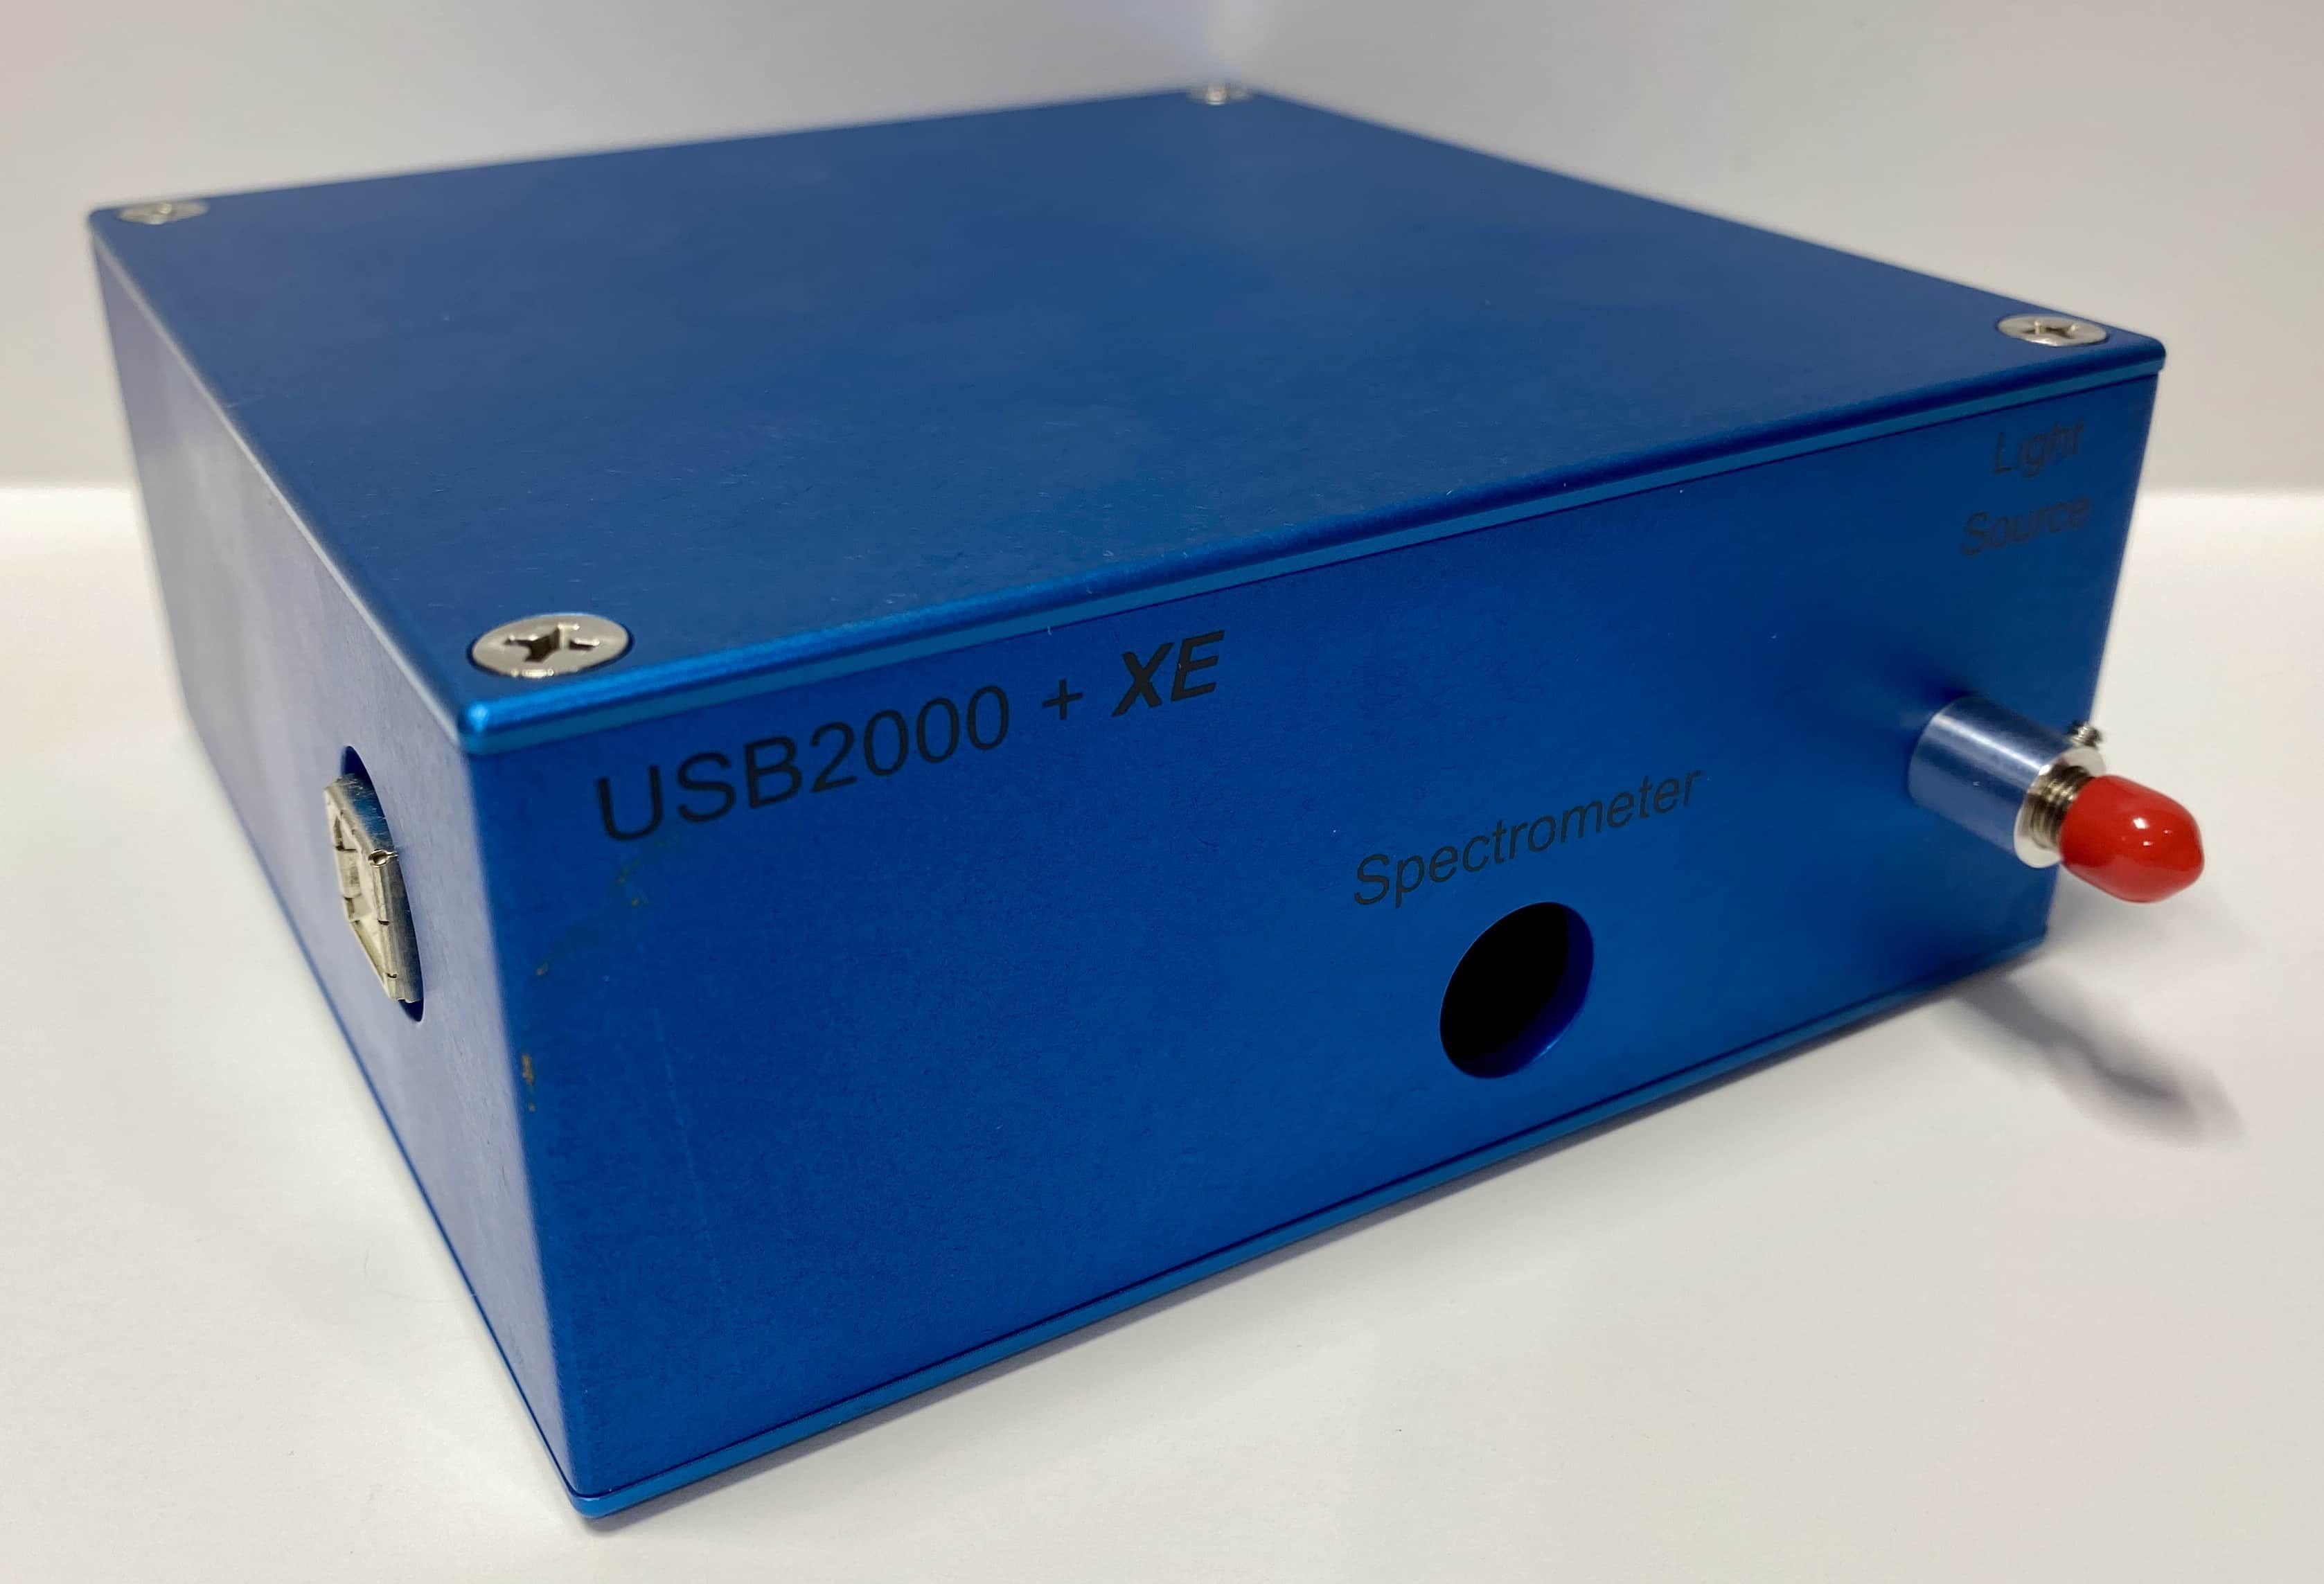 USB2000+XE Spectrophotometer - Lamp Module